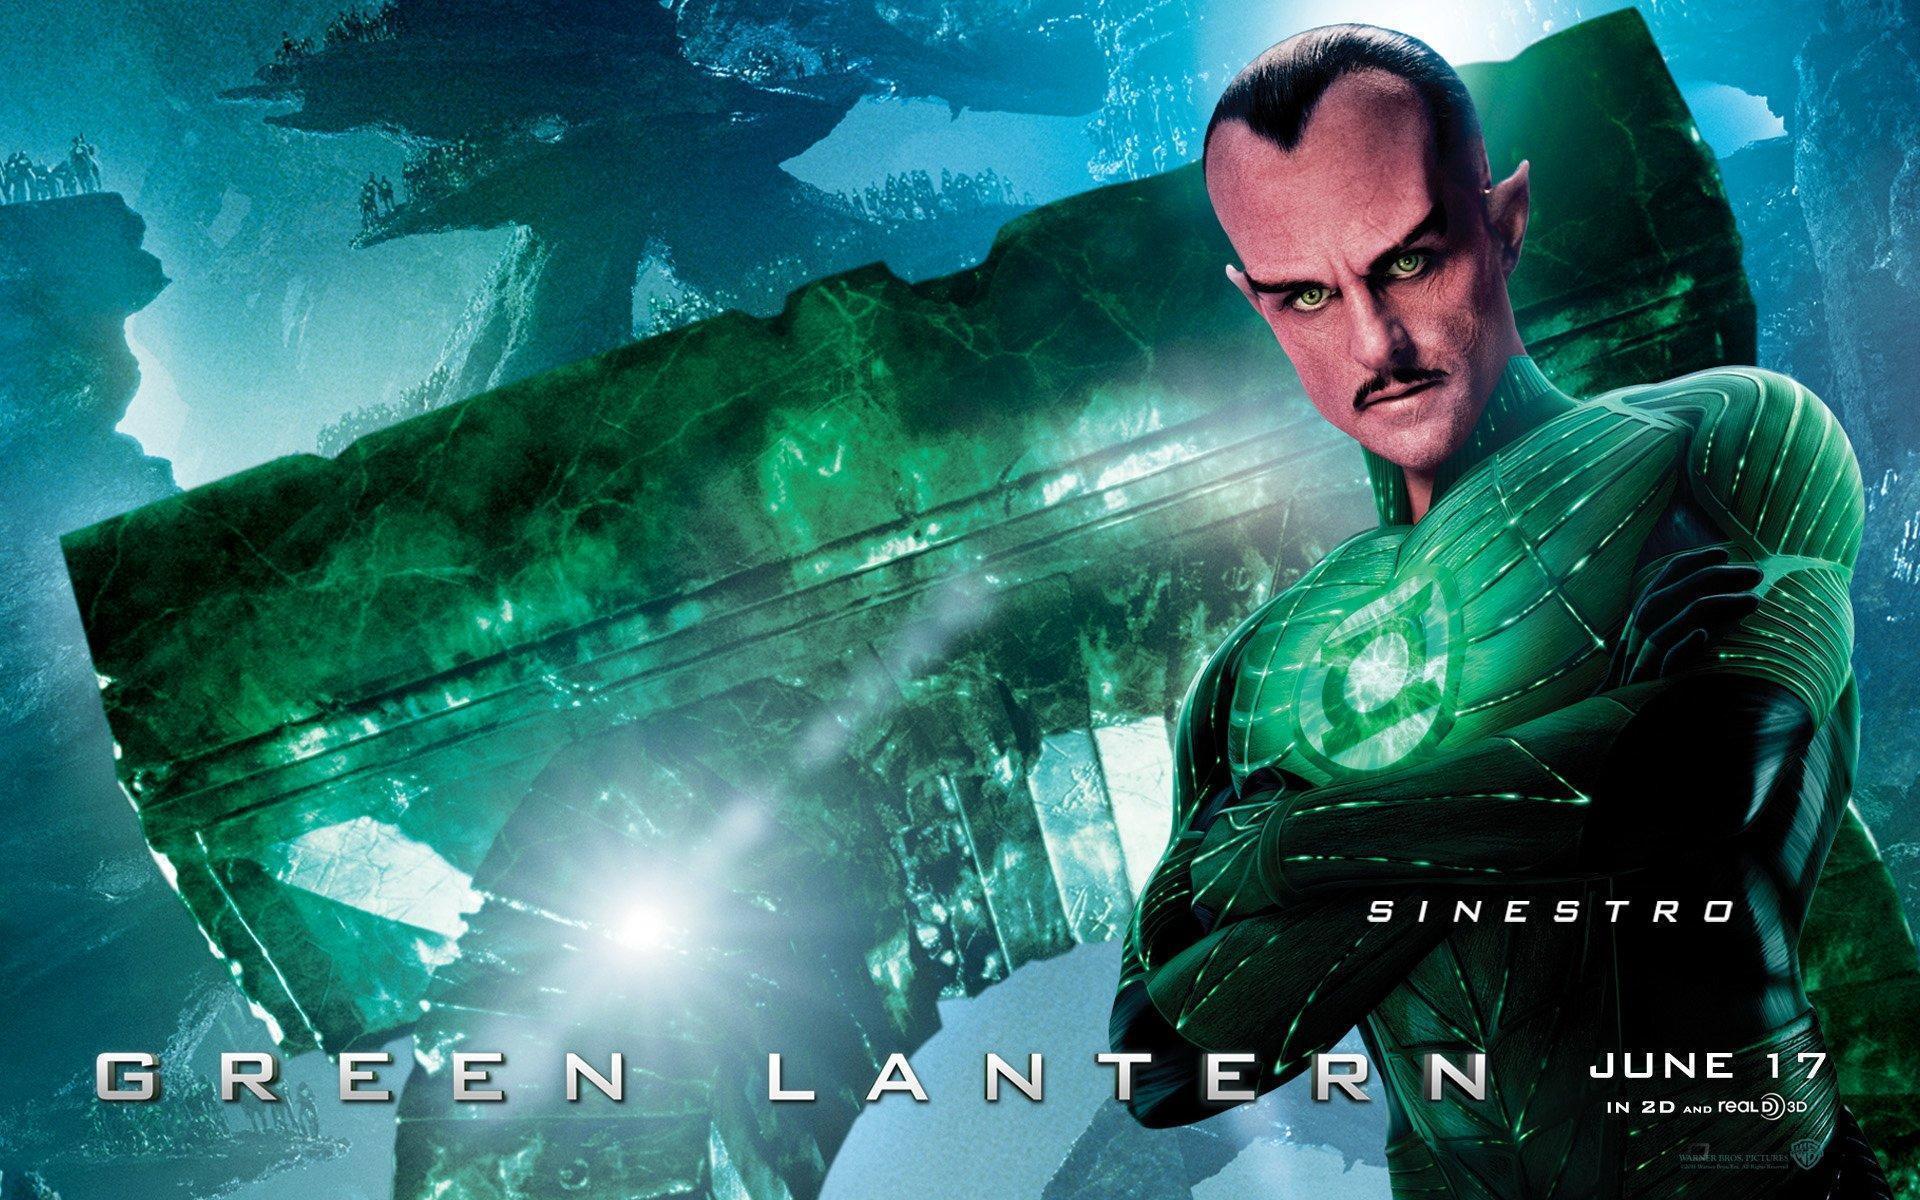 Green Lantern: Sinestro wallpapers | Green Lantern: Sinestro stock ...